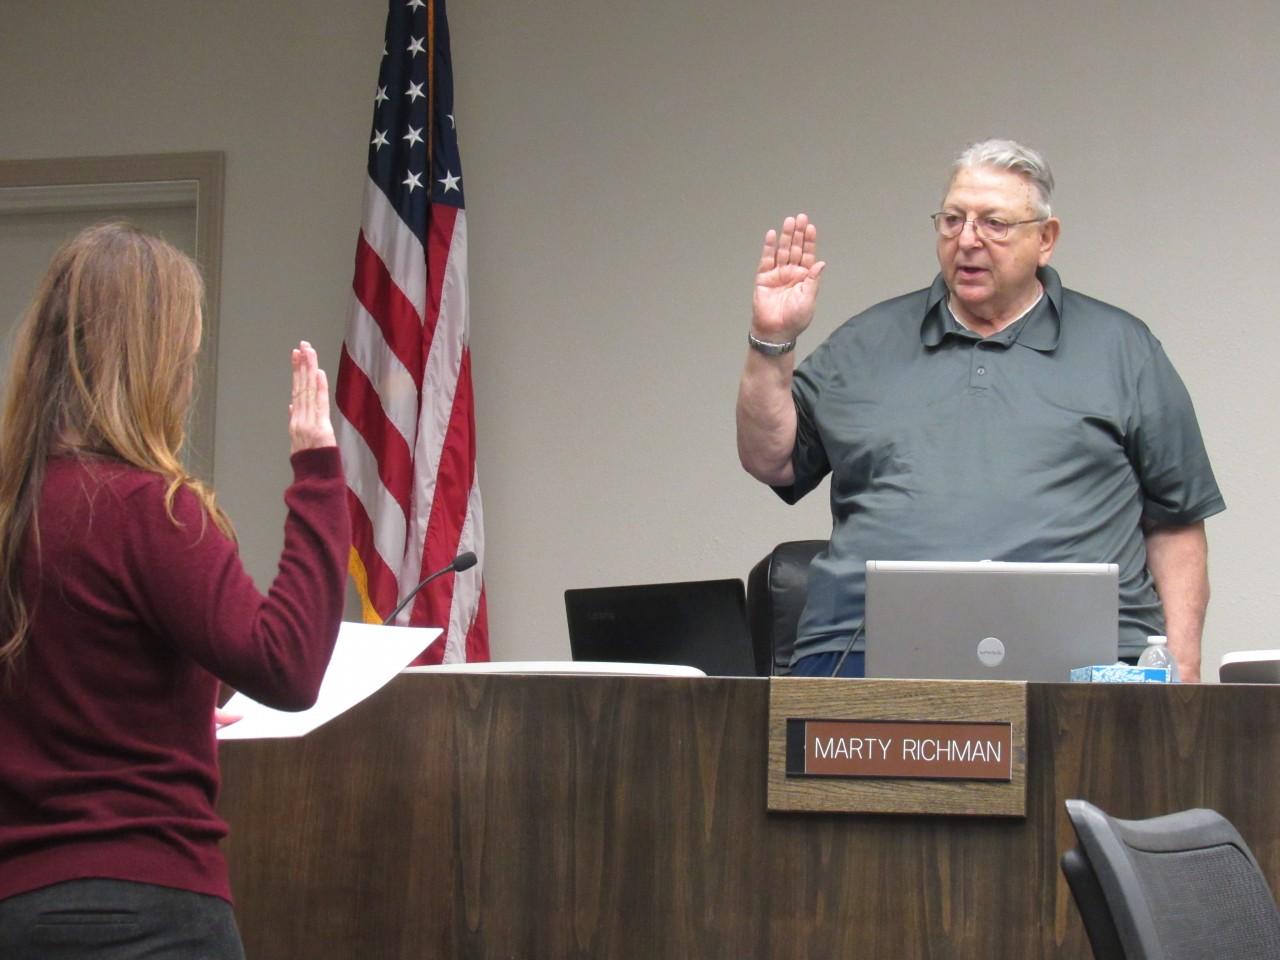 Councilman Marty Richman being sworn in as Vice Mayor. Photo by Noe Magaña.